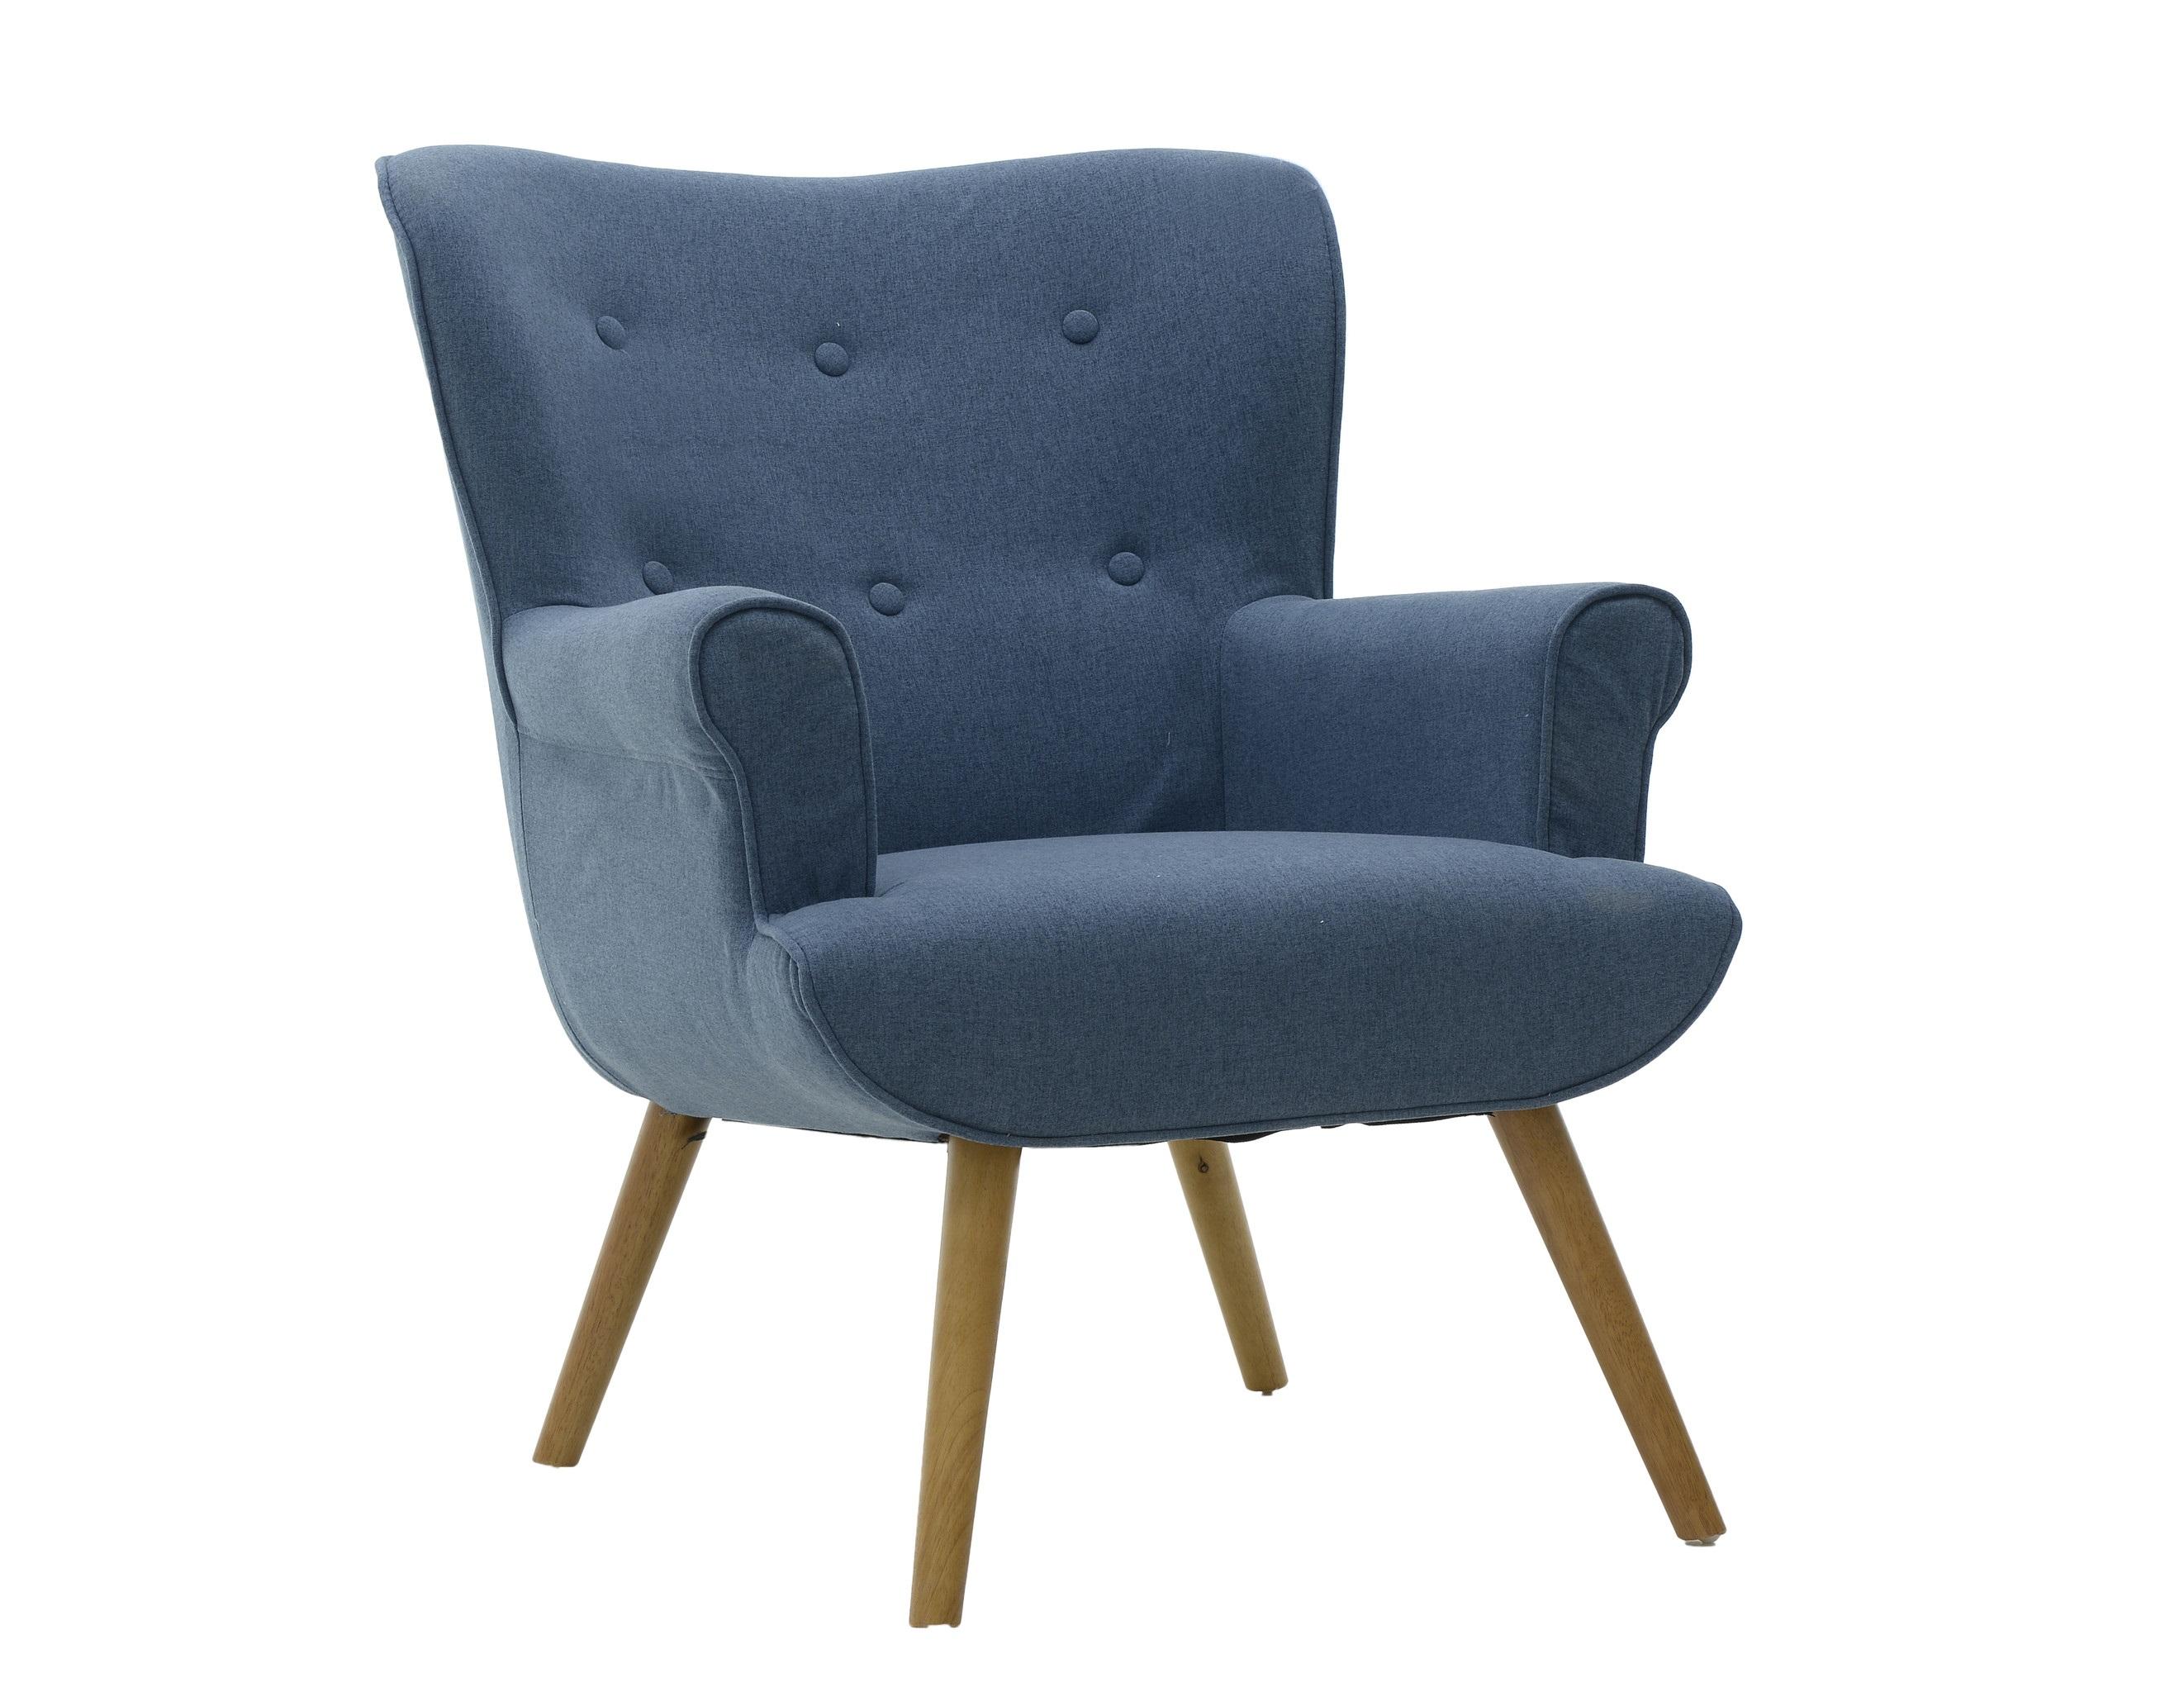 Кресло To4rooms 15441552 от thefurnish